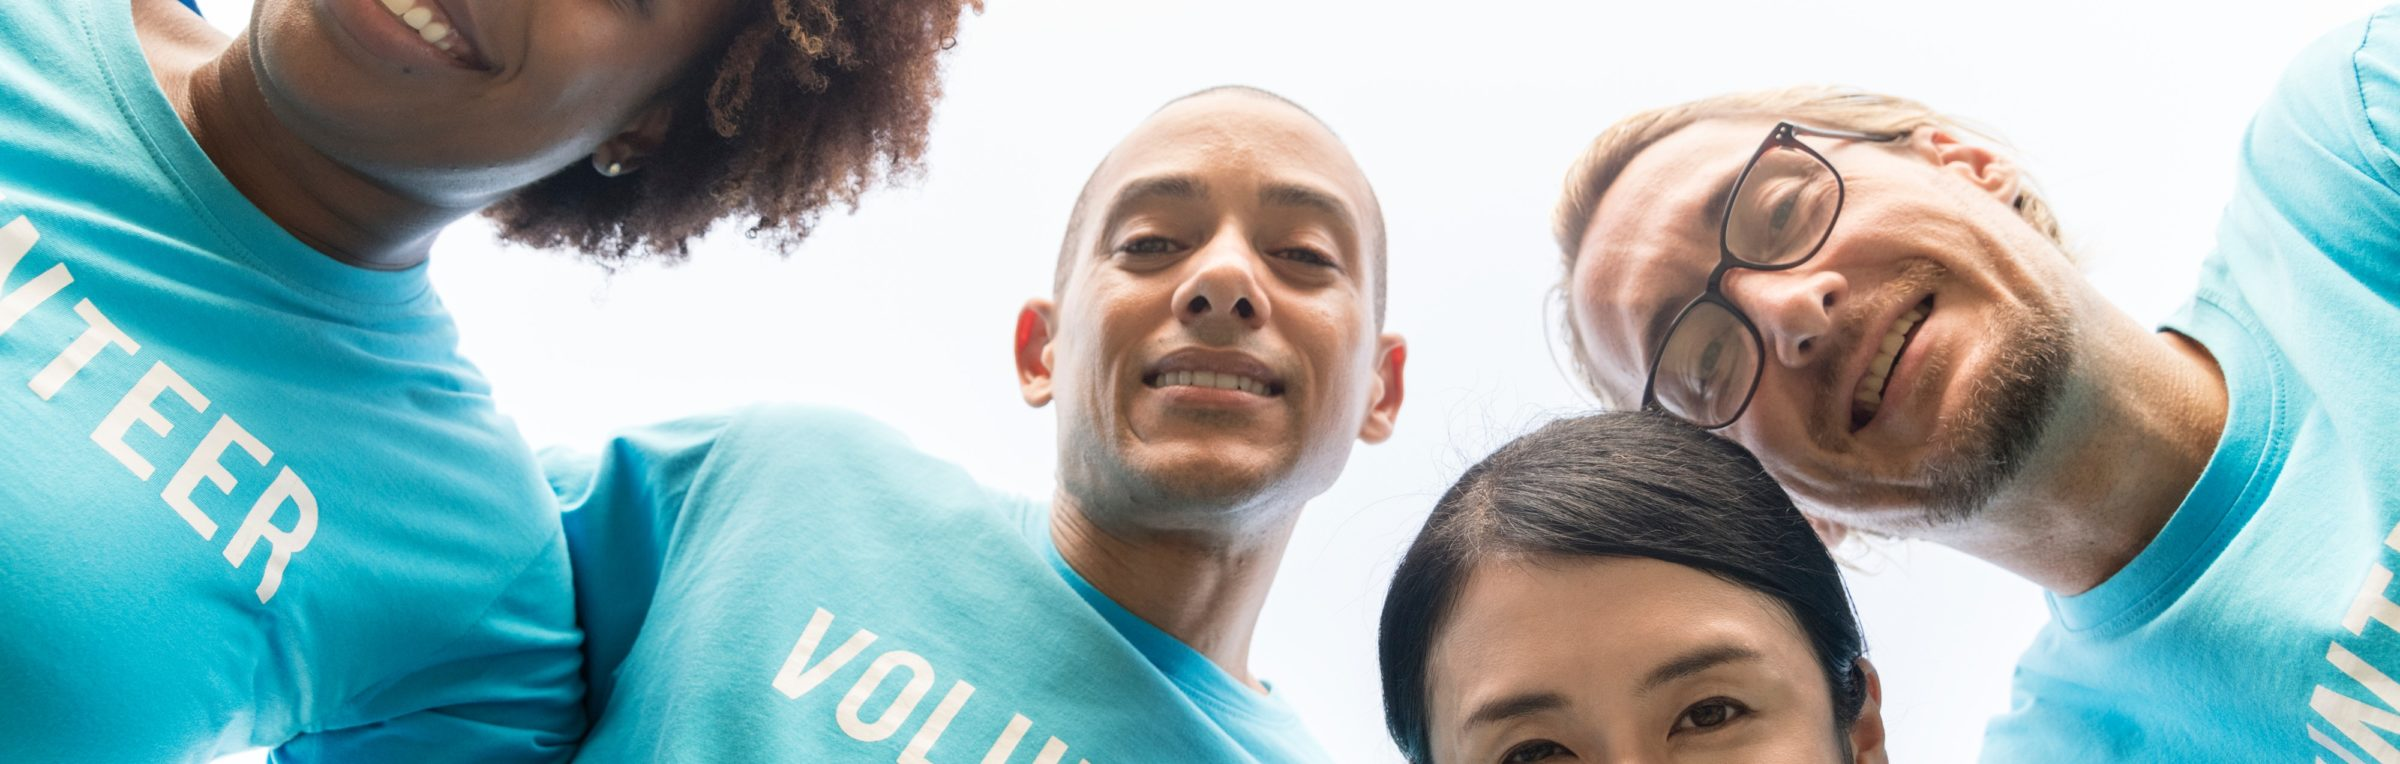 Vrijwilligers glimlachen